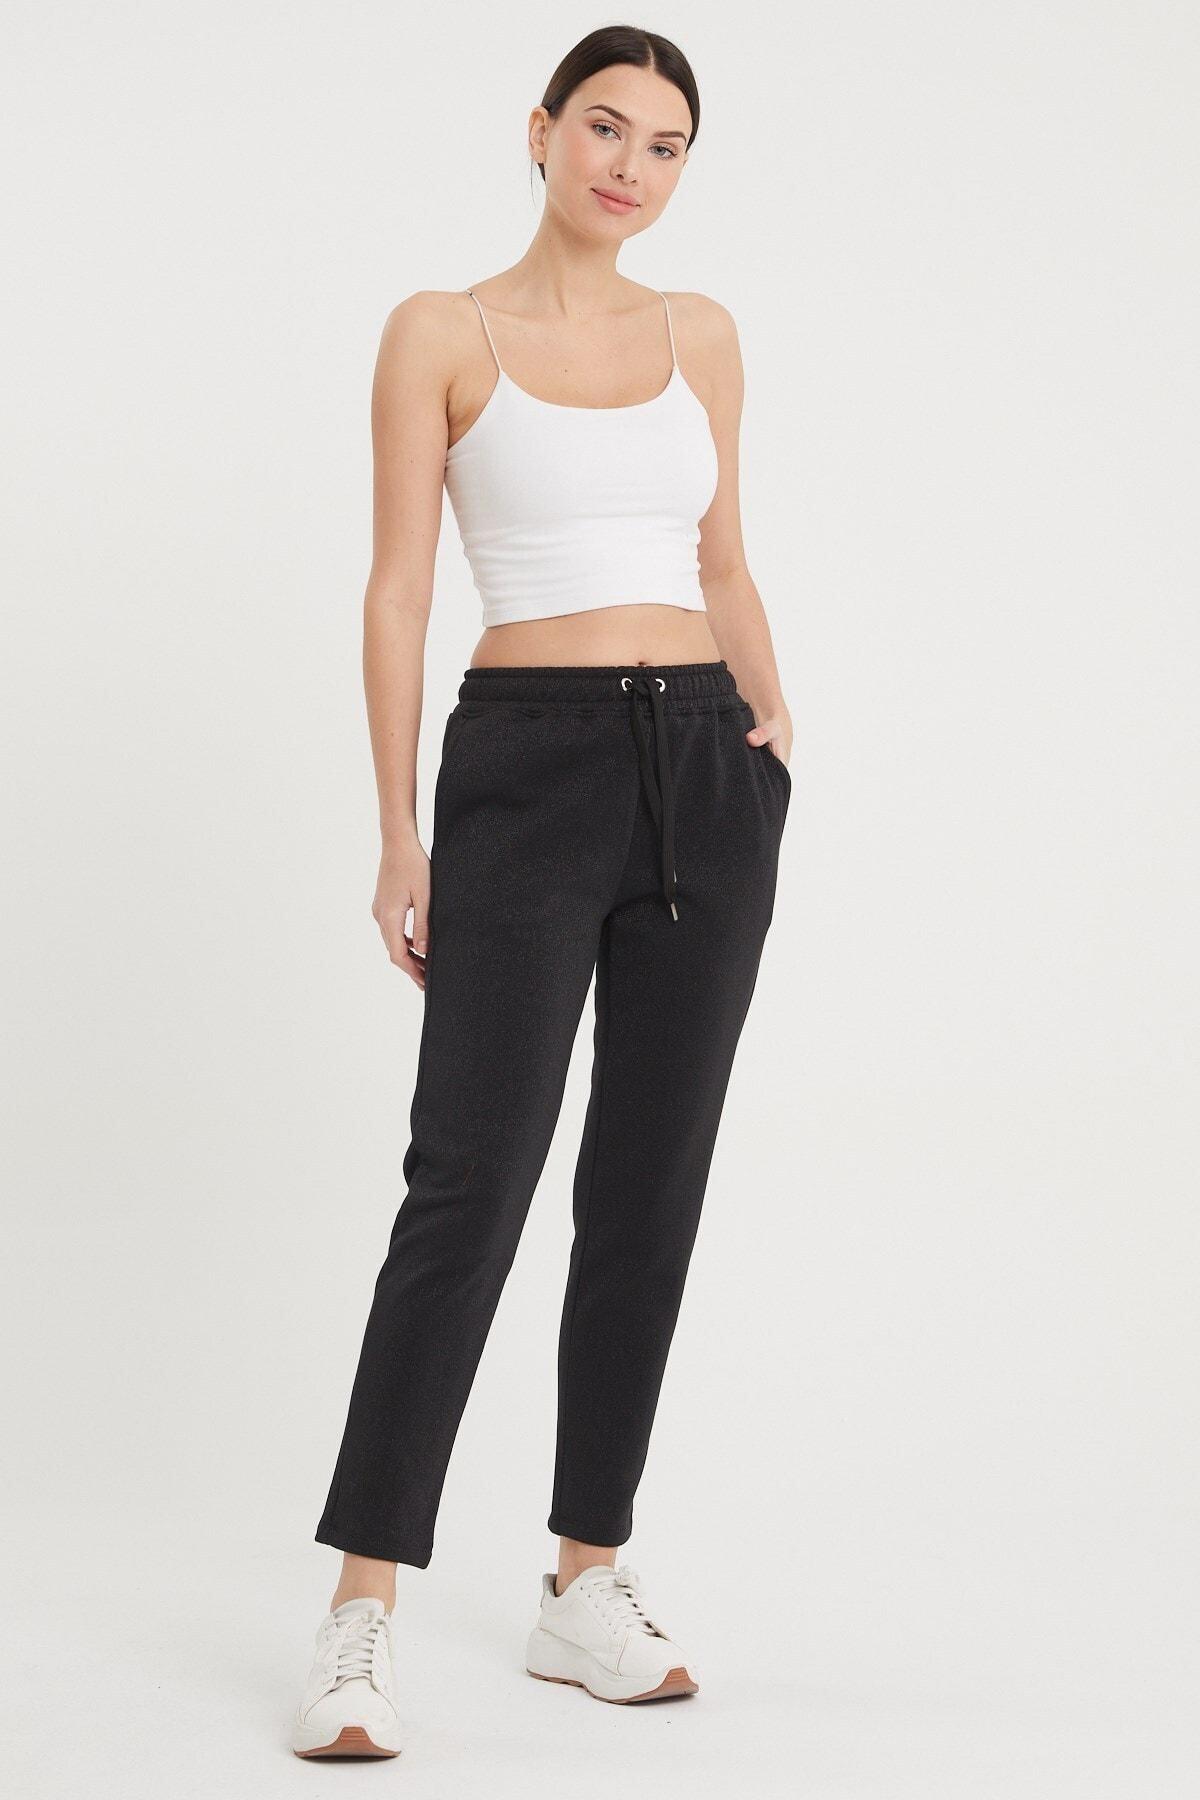 VENA Kadın Siyah Larıssa Simli Joggıng Pantolon 1